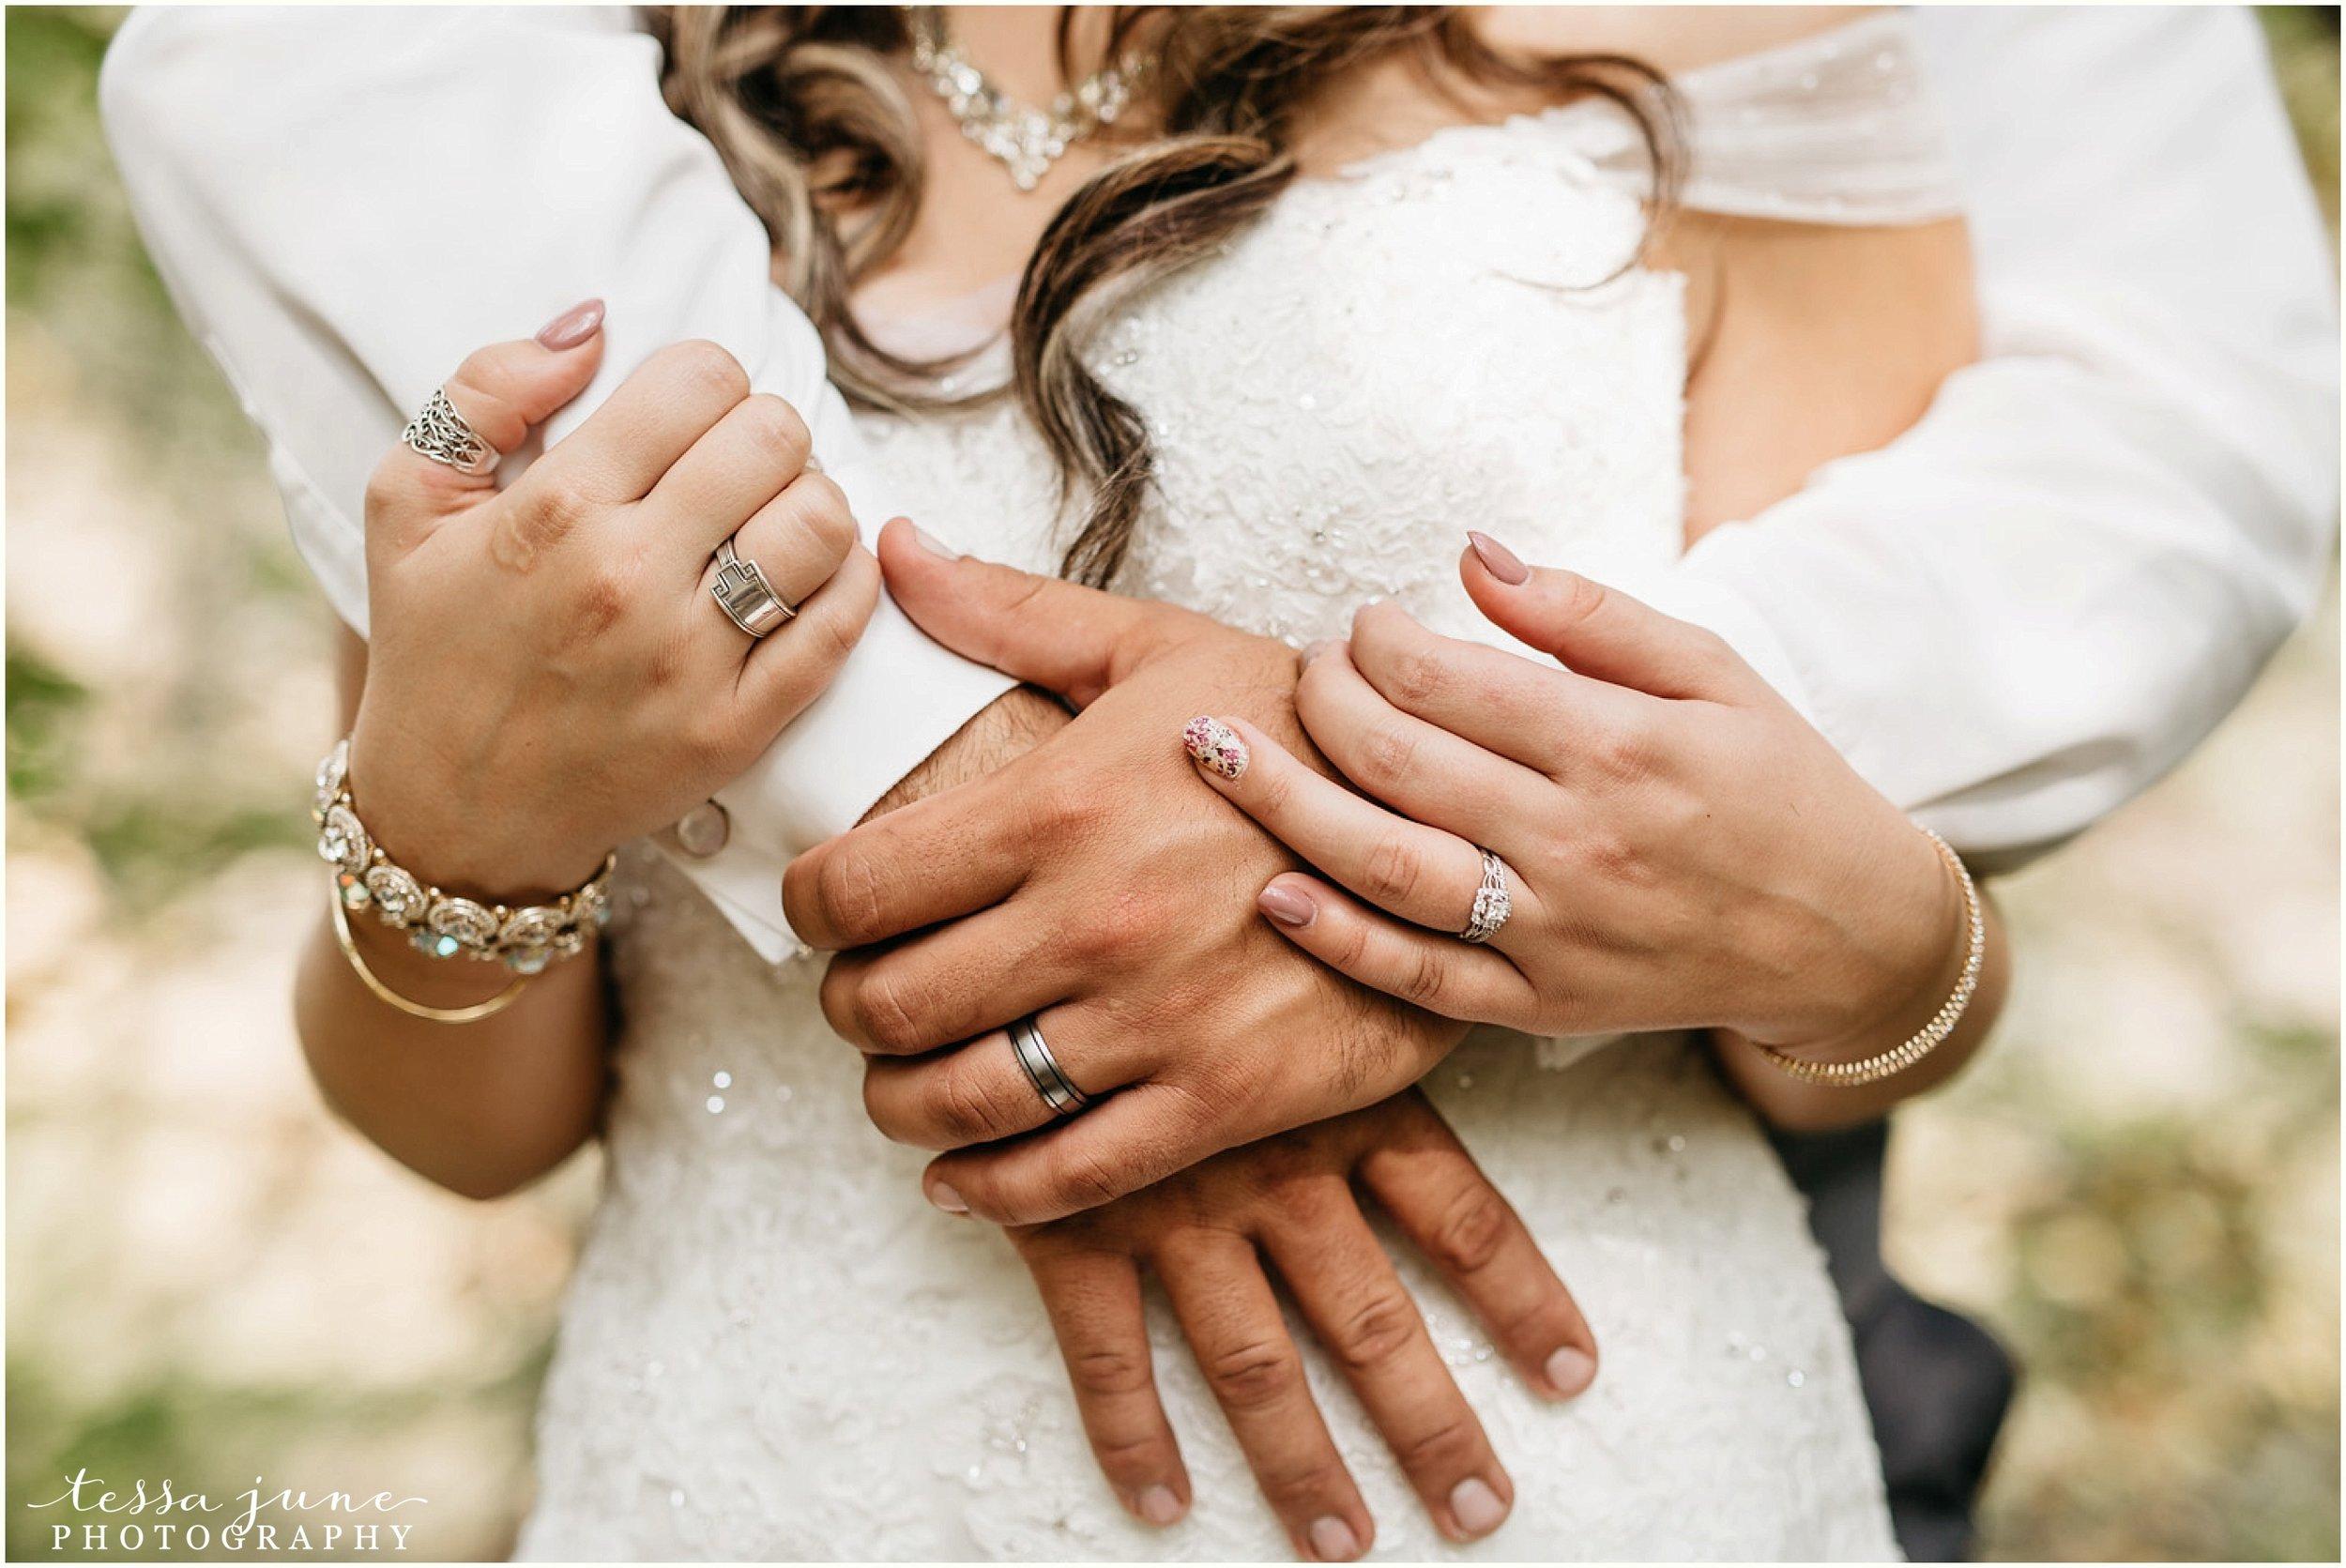 bohemian-minnesota-wedding-mismatched-bridesmaid-dresses-waterfall-st-cloud-tessa-june-photography-51.jpg